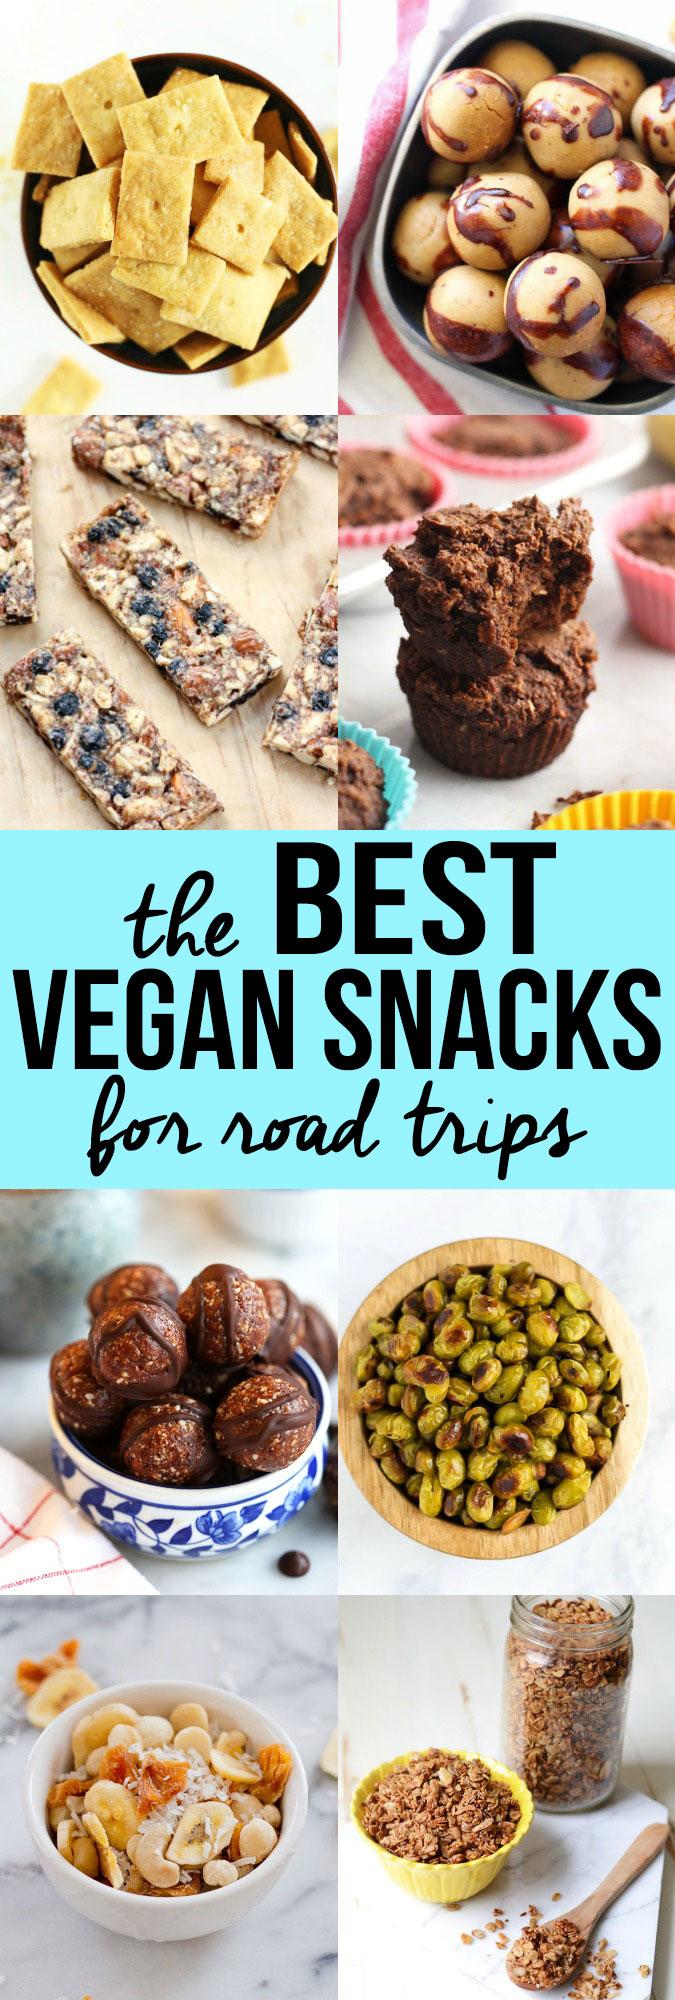 The Best Vegan Snacks For Road Trips Emilie Eats